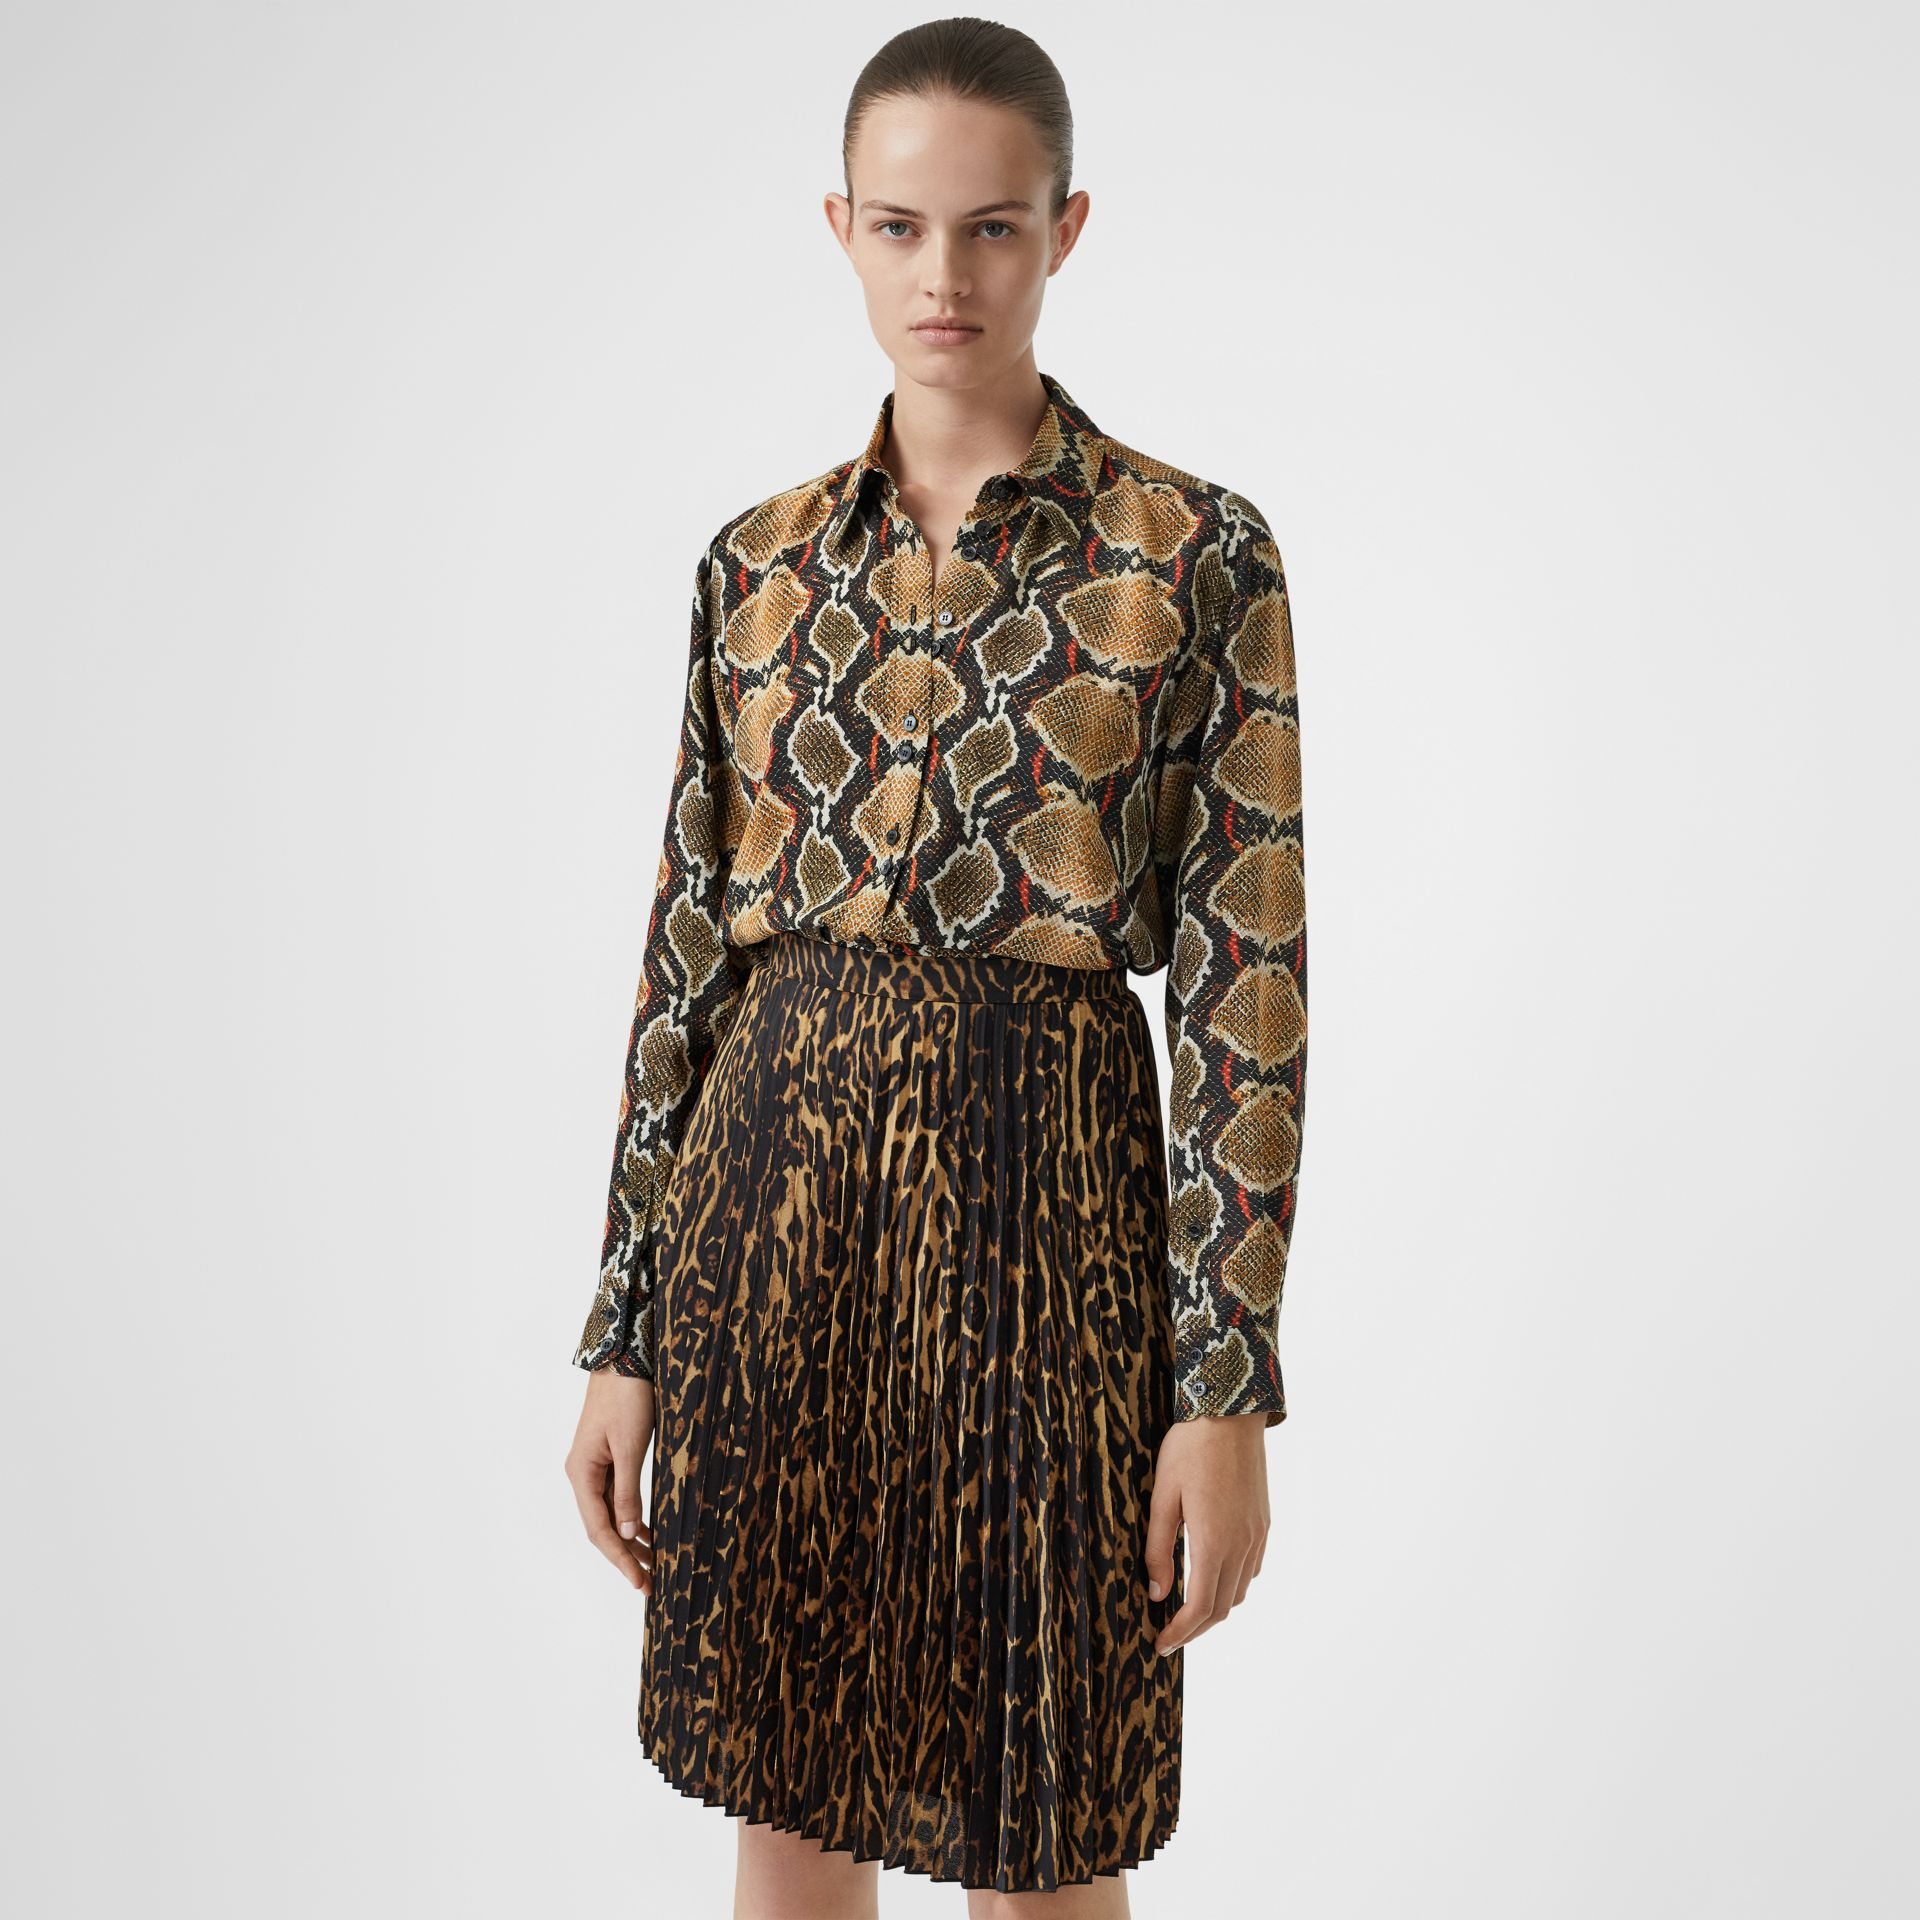 Python Print Silk Shirt in Soft Cocoa - Women | Burberry United Kingdom - gallery image 0